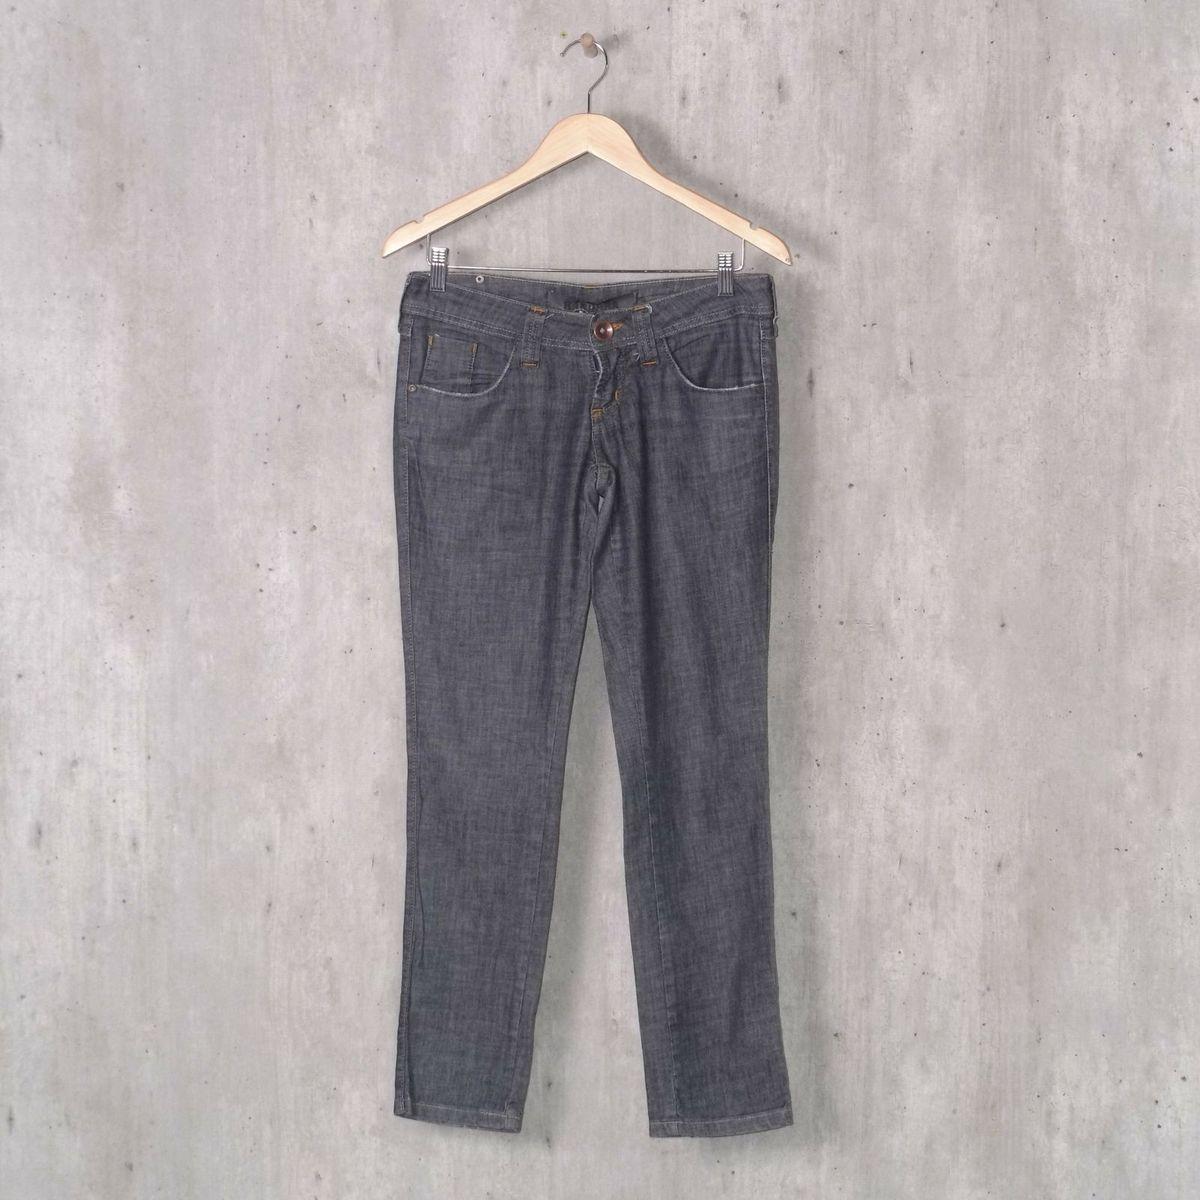 db9c8e6d3 calça skinny handara - calças handara.  Czm6ly9wag90b3muzw5qb2vplmnvbs5ici9wcm9kdwn0cy83mzk0mtqxl2izzdyxogjiytg3mdviy2i4nzeznta1mtg1mzk5ogqzlmpwzw  ...